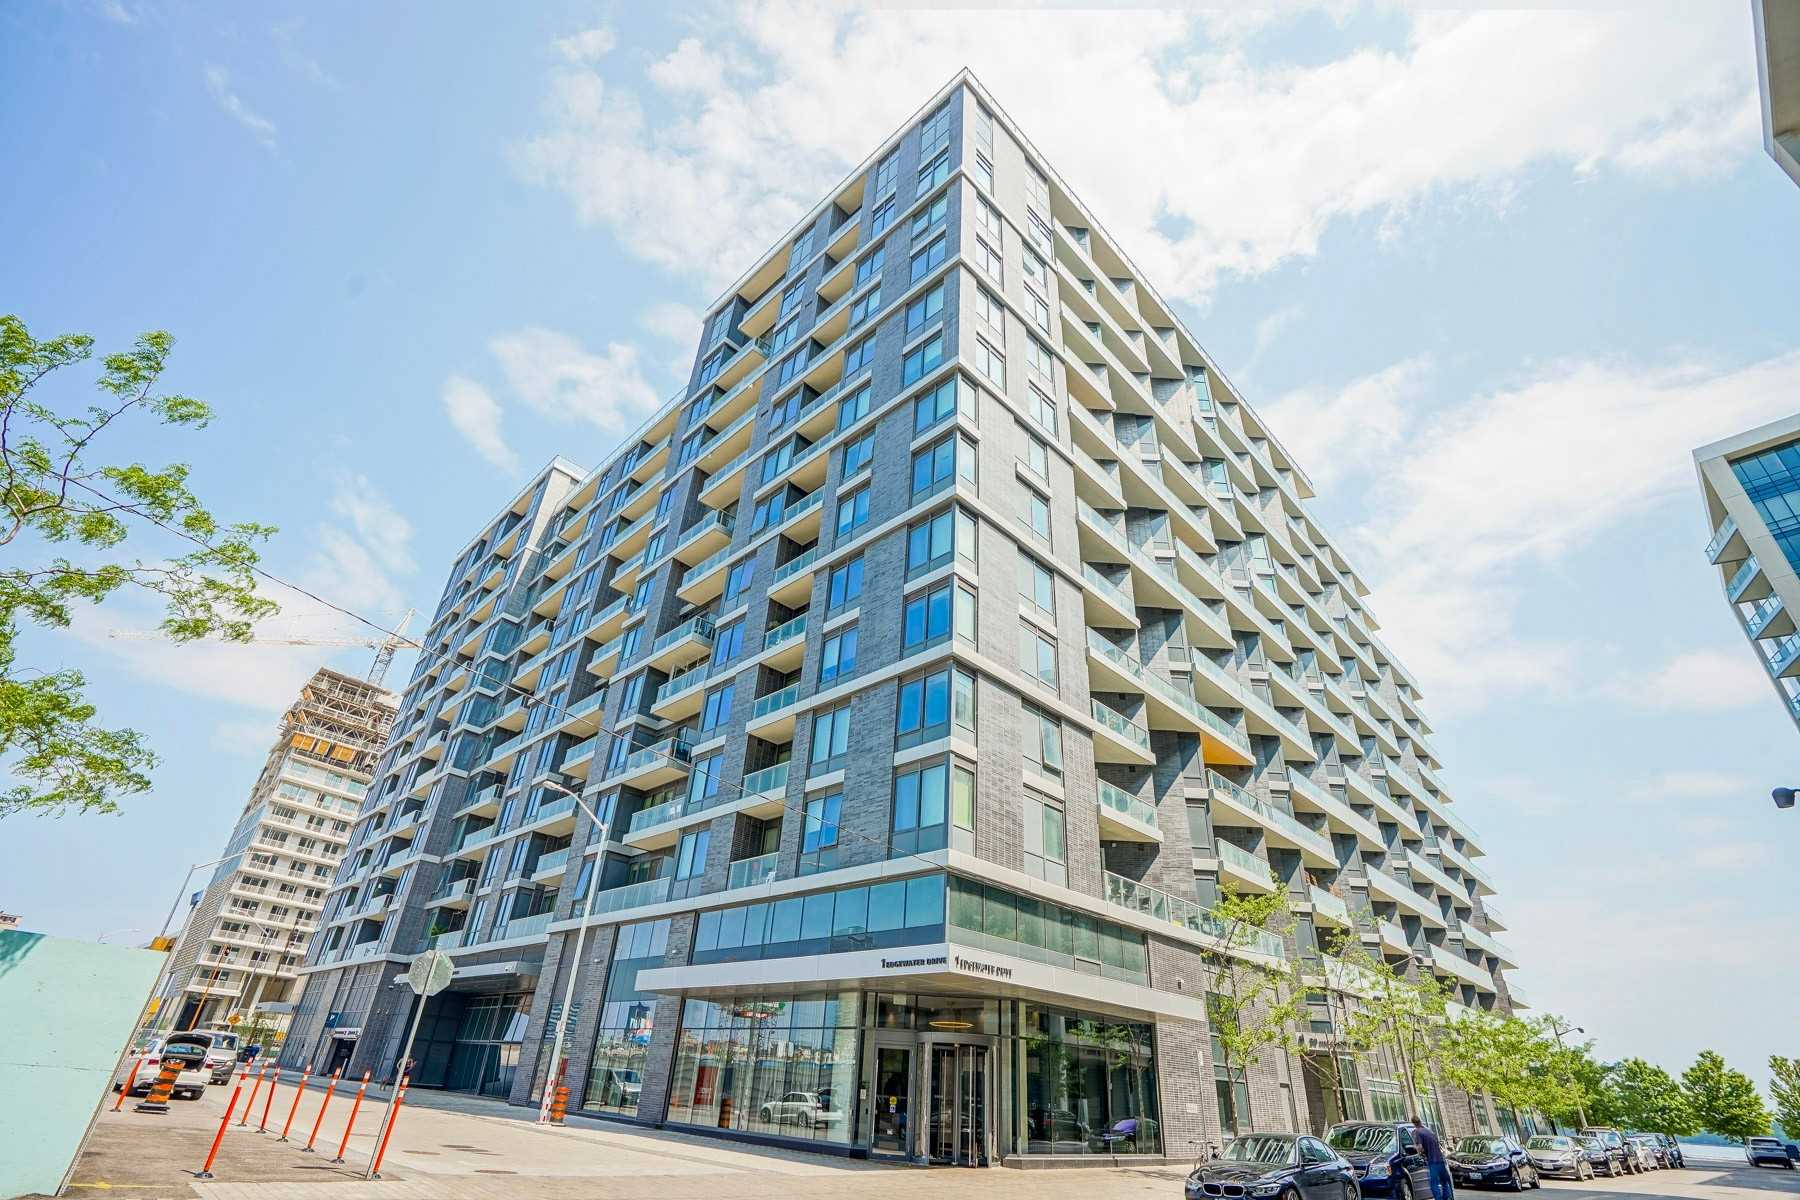 1 Edgewater Dr, Toronto, Ontario M5A0L1, 4 Bedrooms Bedrooms, 9 Rooms Rooms,4 BathroomsBathrooms,Condo Apt,For Sale,Edgewater,C5060939